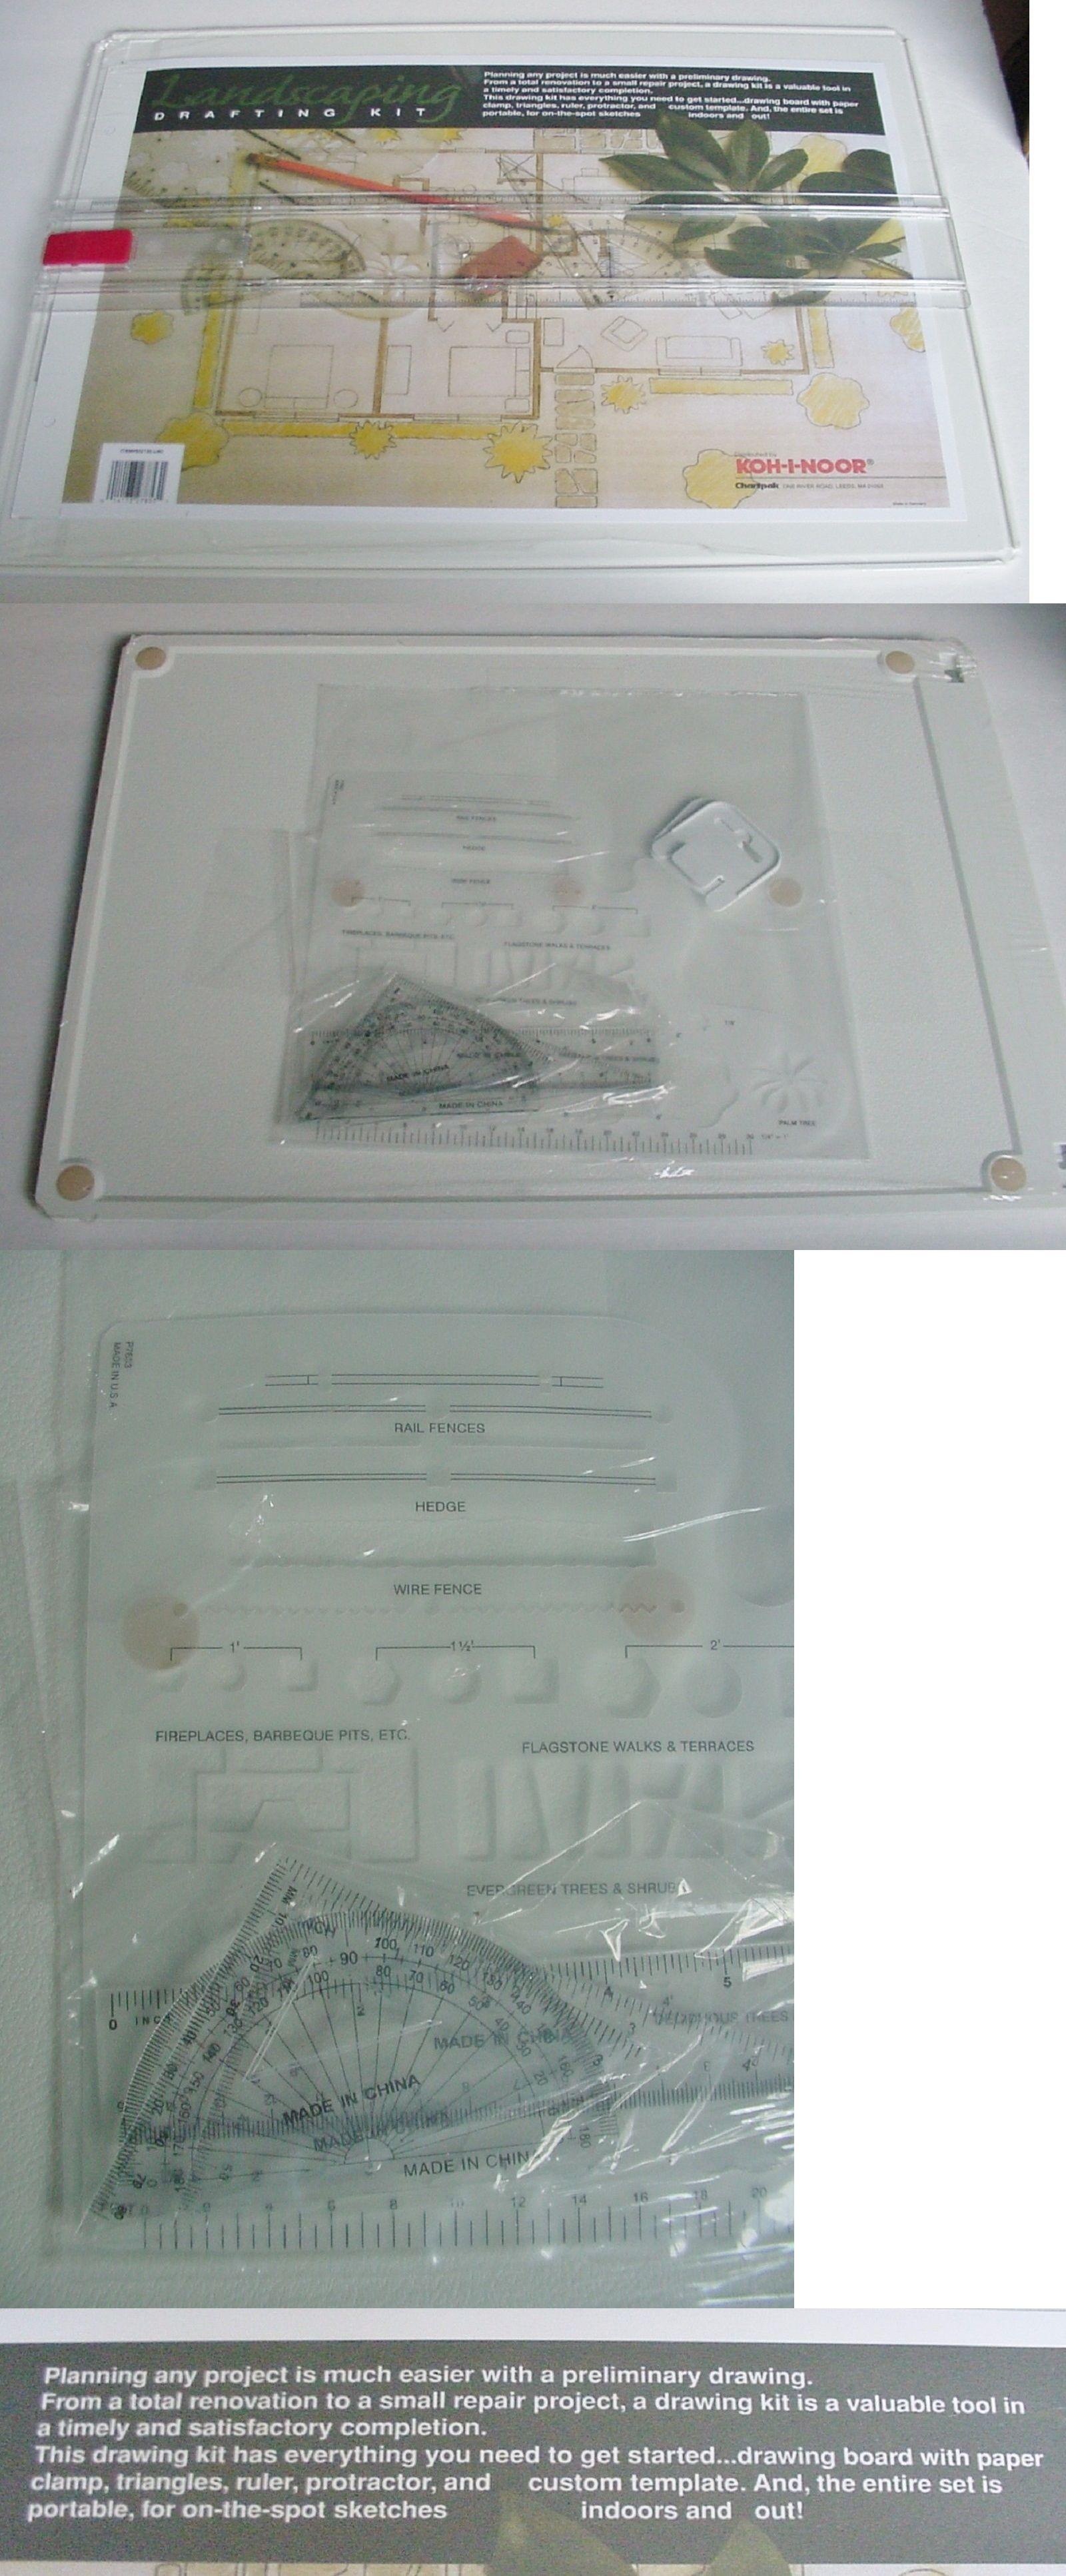 Koh I Noor Interior Design Drafting Kit Psoriasisgurucom